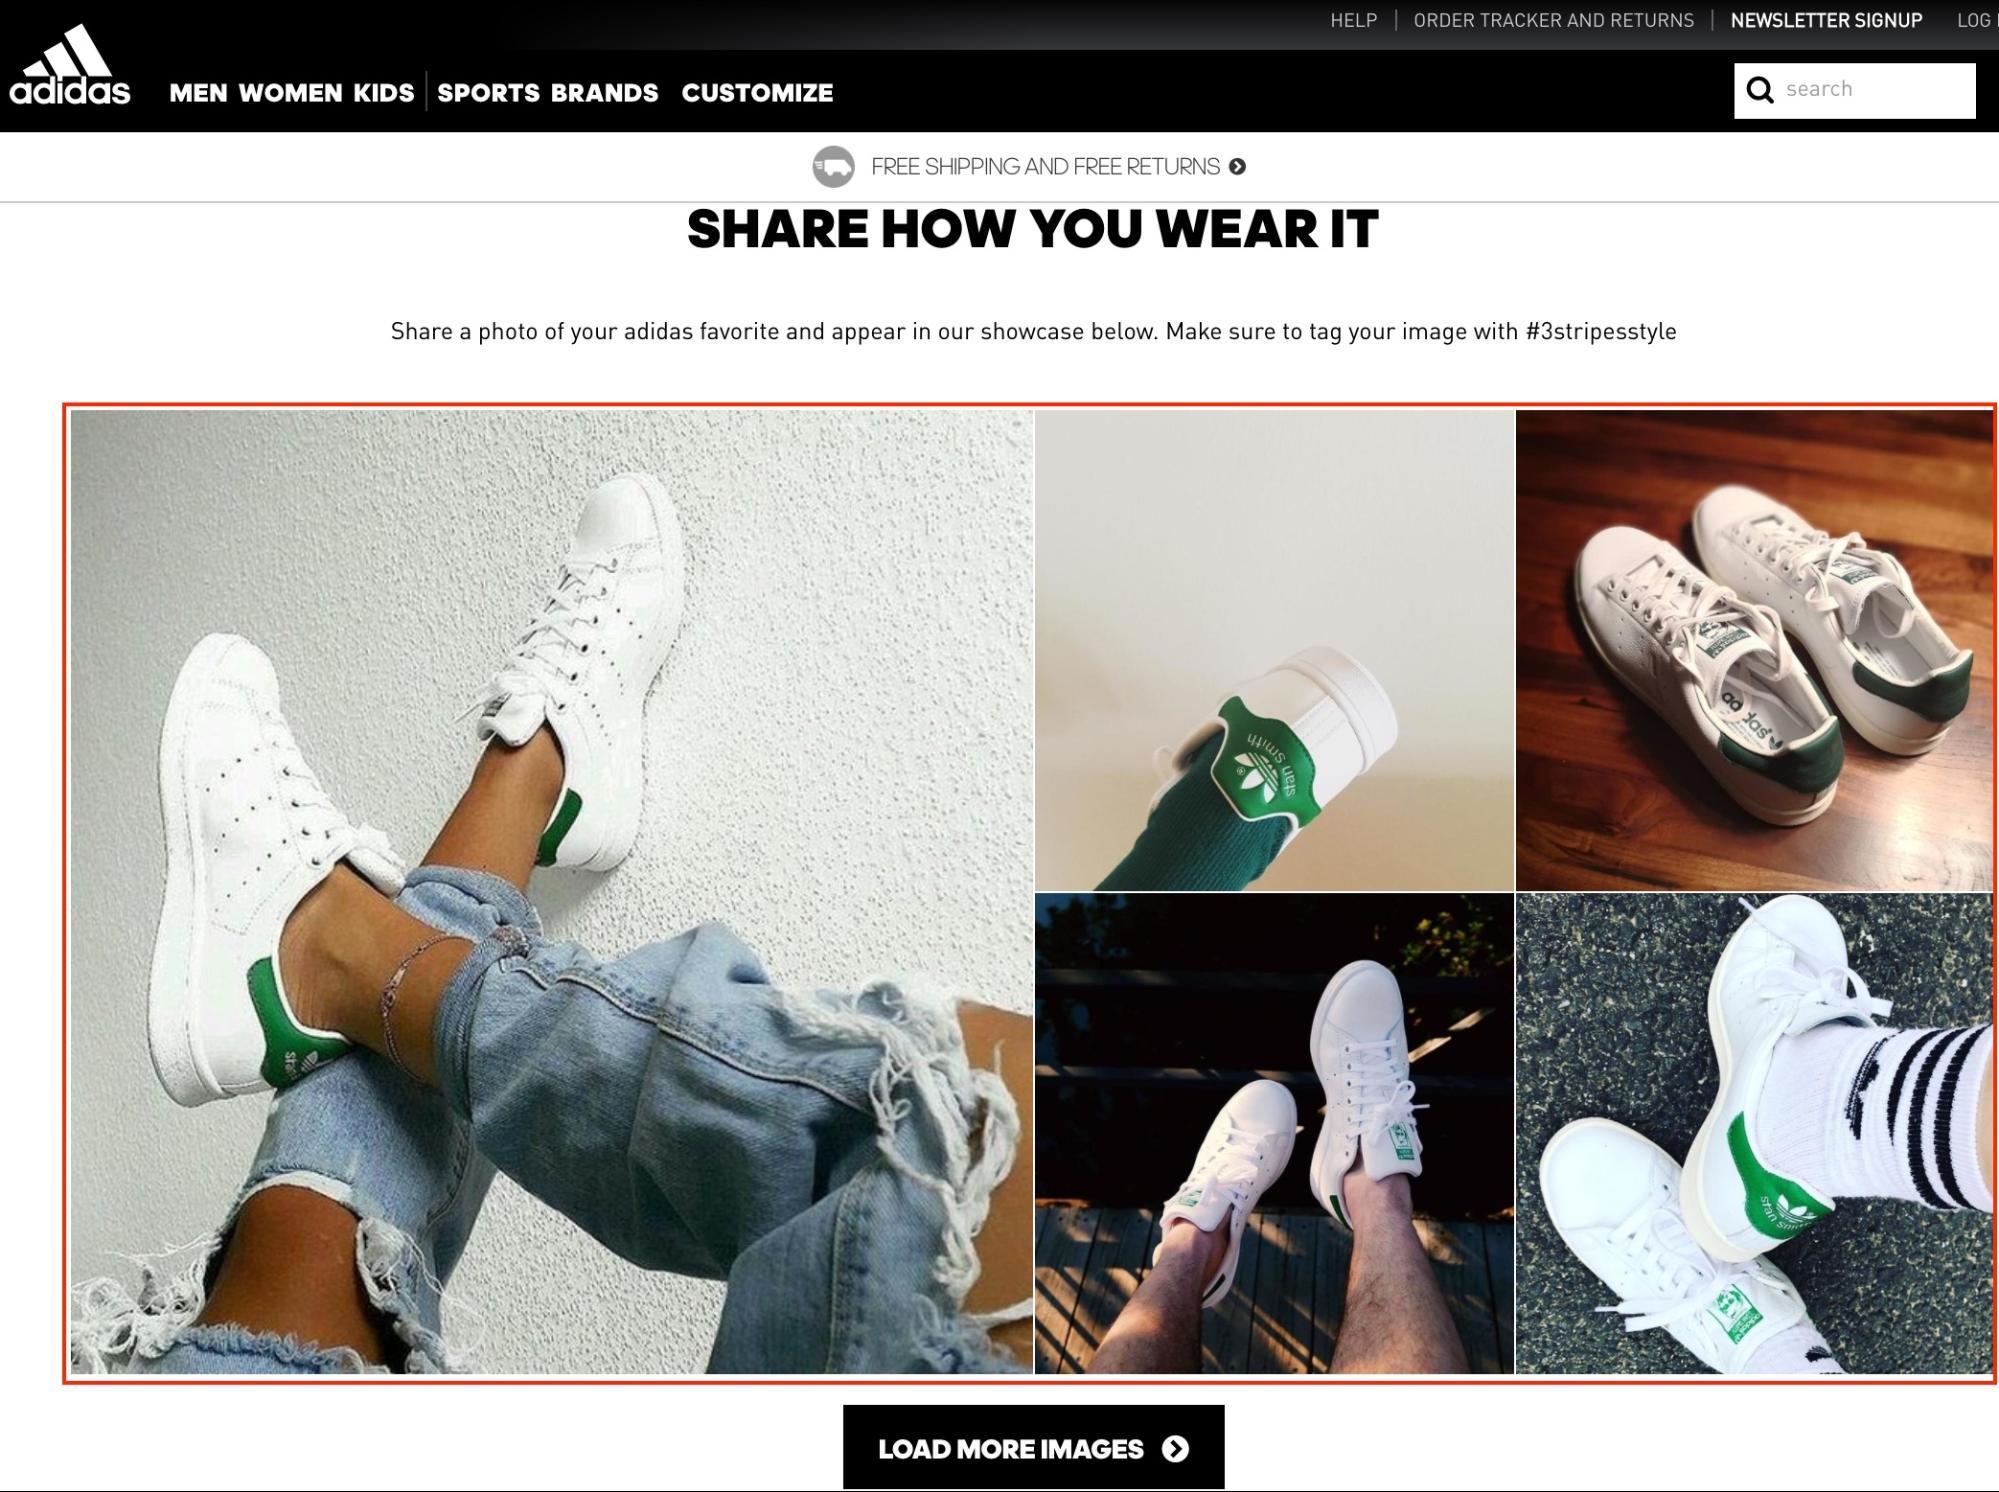 Screenshot showing adidas